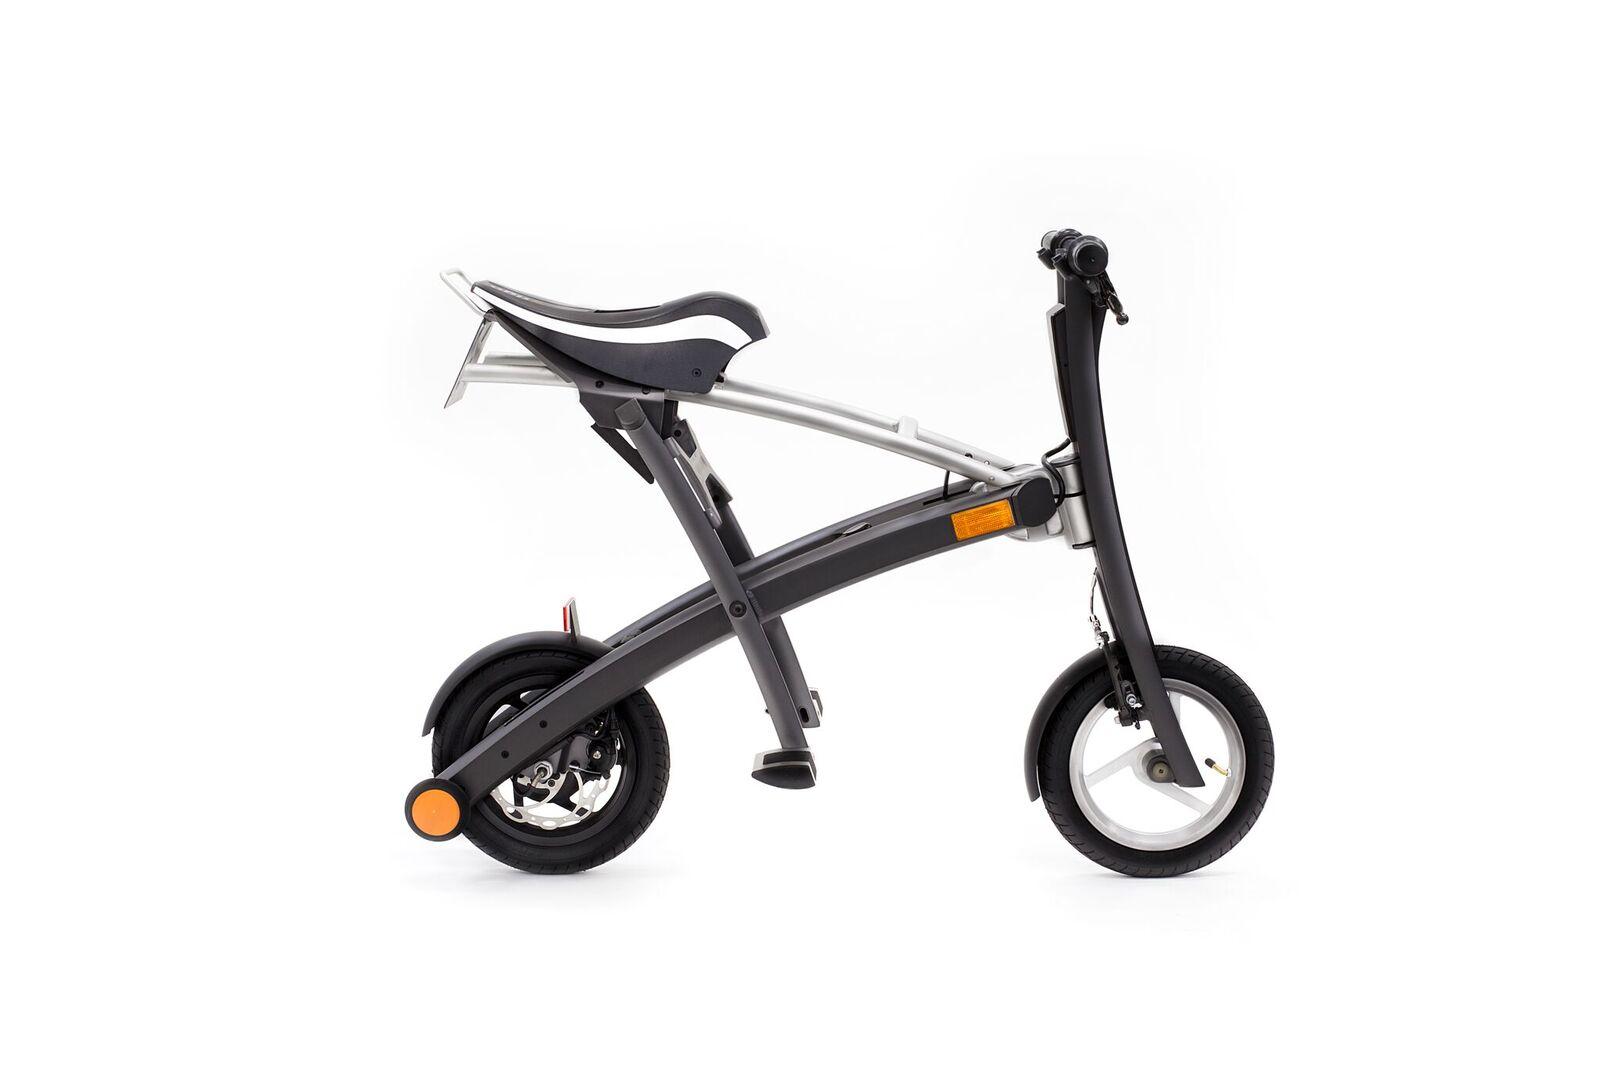 Stigo S+ Electric Scooter-Bike